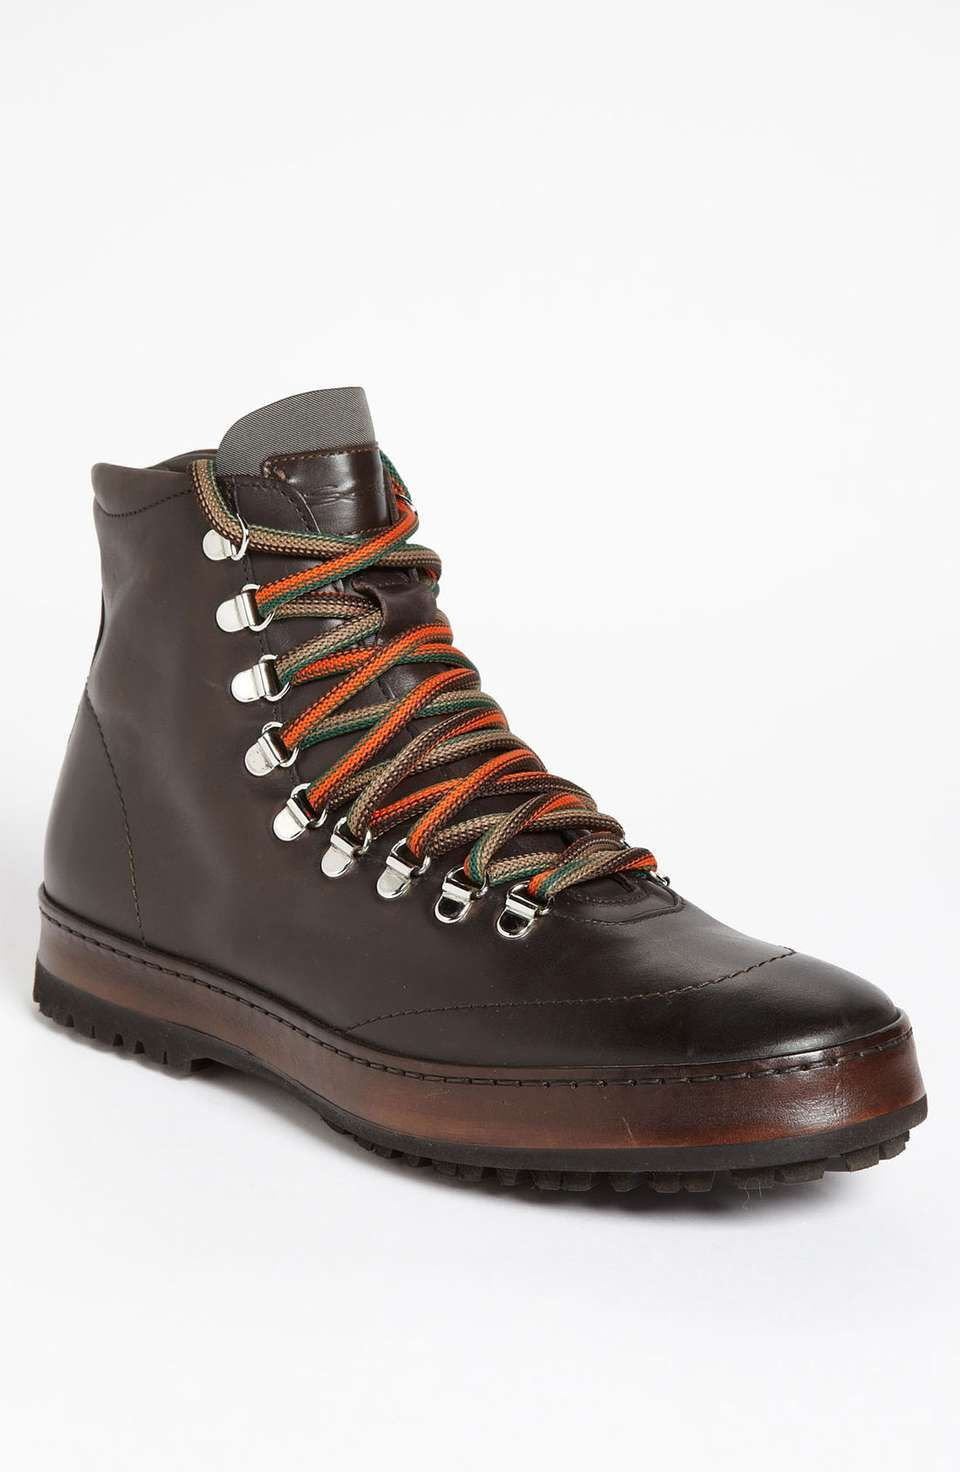 Santoni 'Cool City' Boot | mens boots | mens hiking boots | fall/